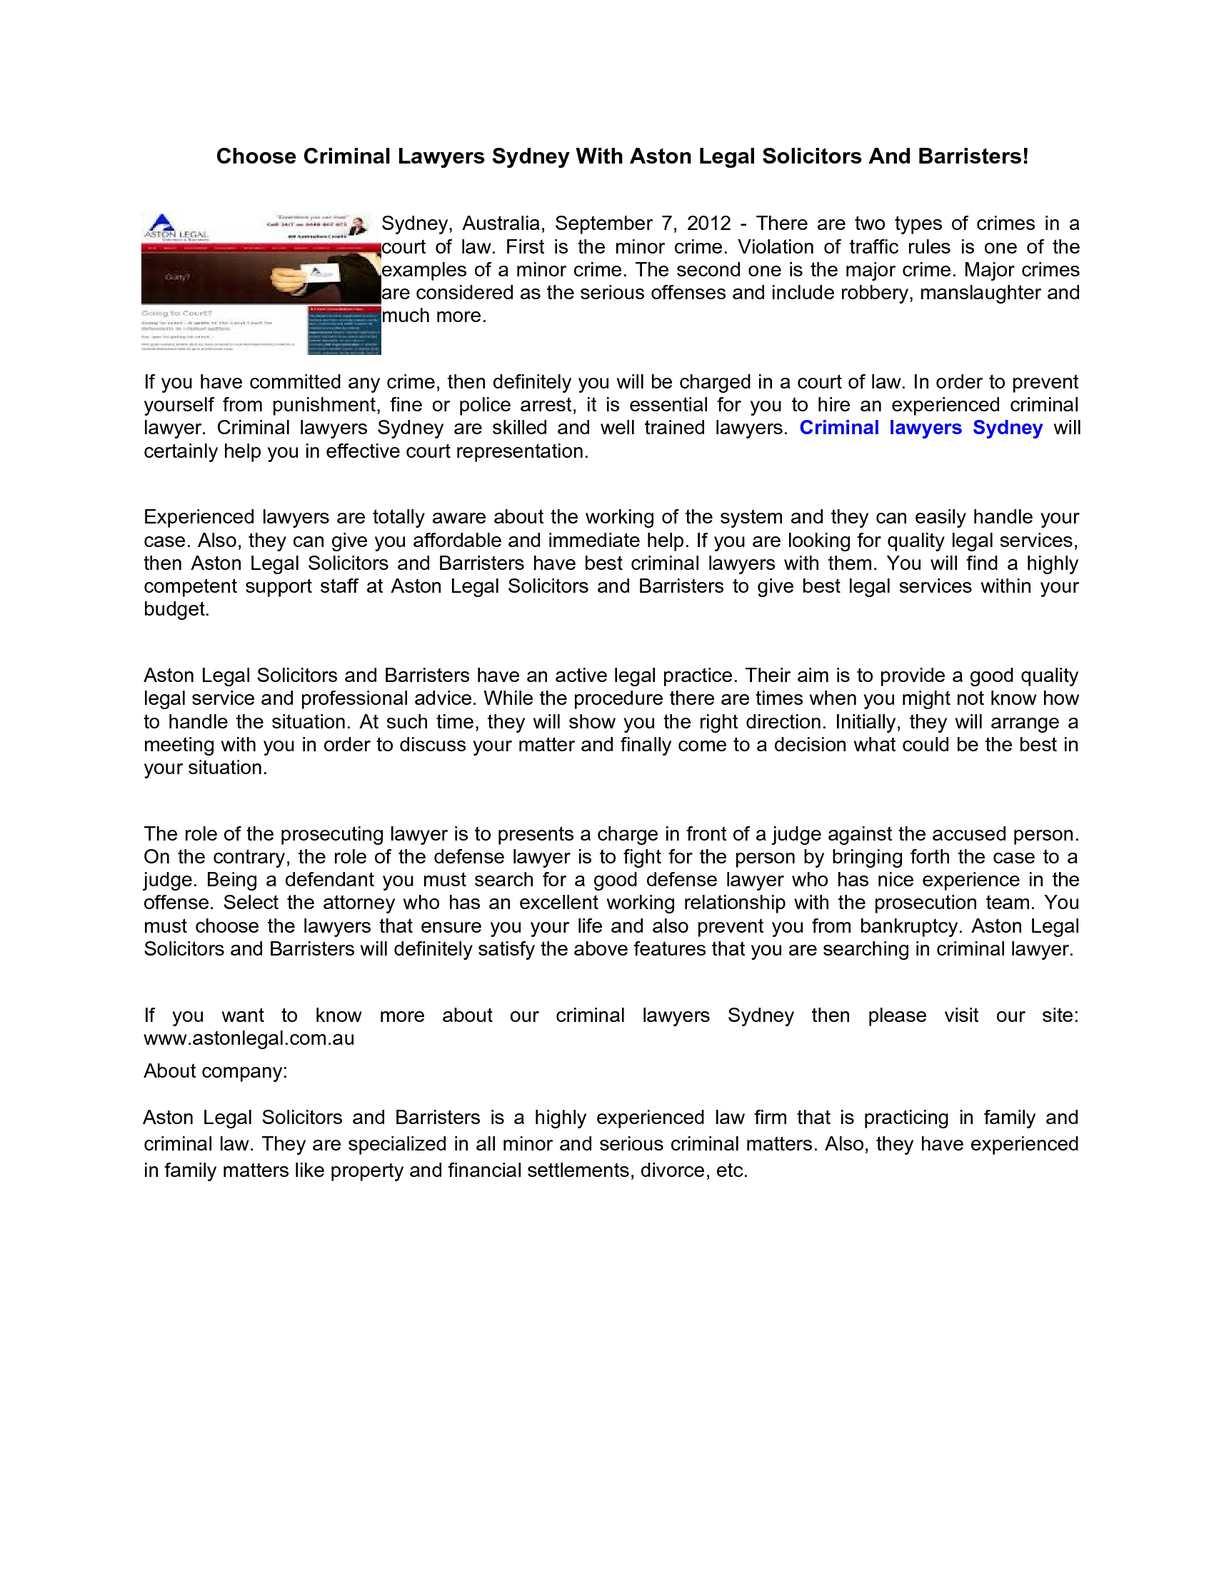 Calamo criminal lawyers sydney solutioingenieria Images